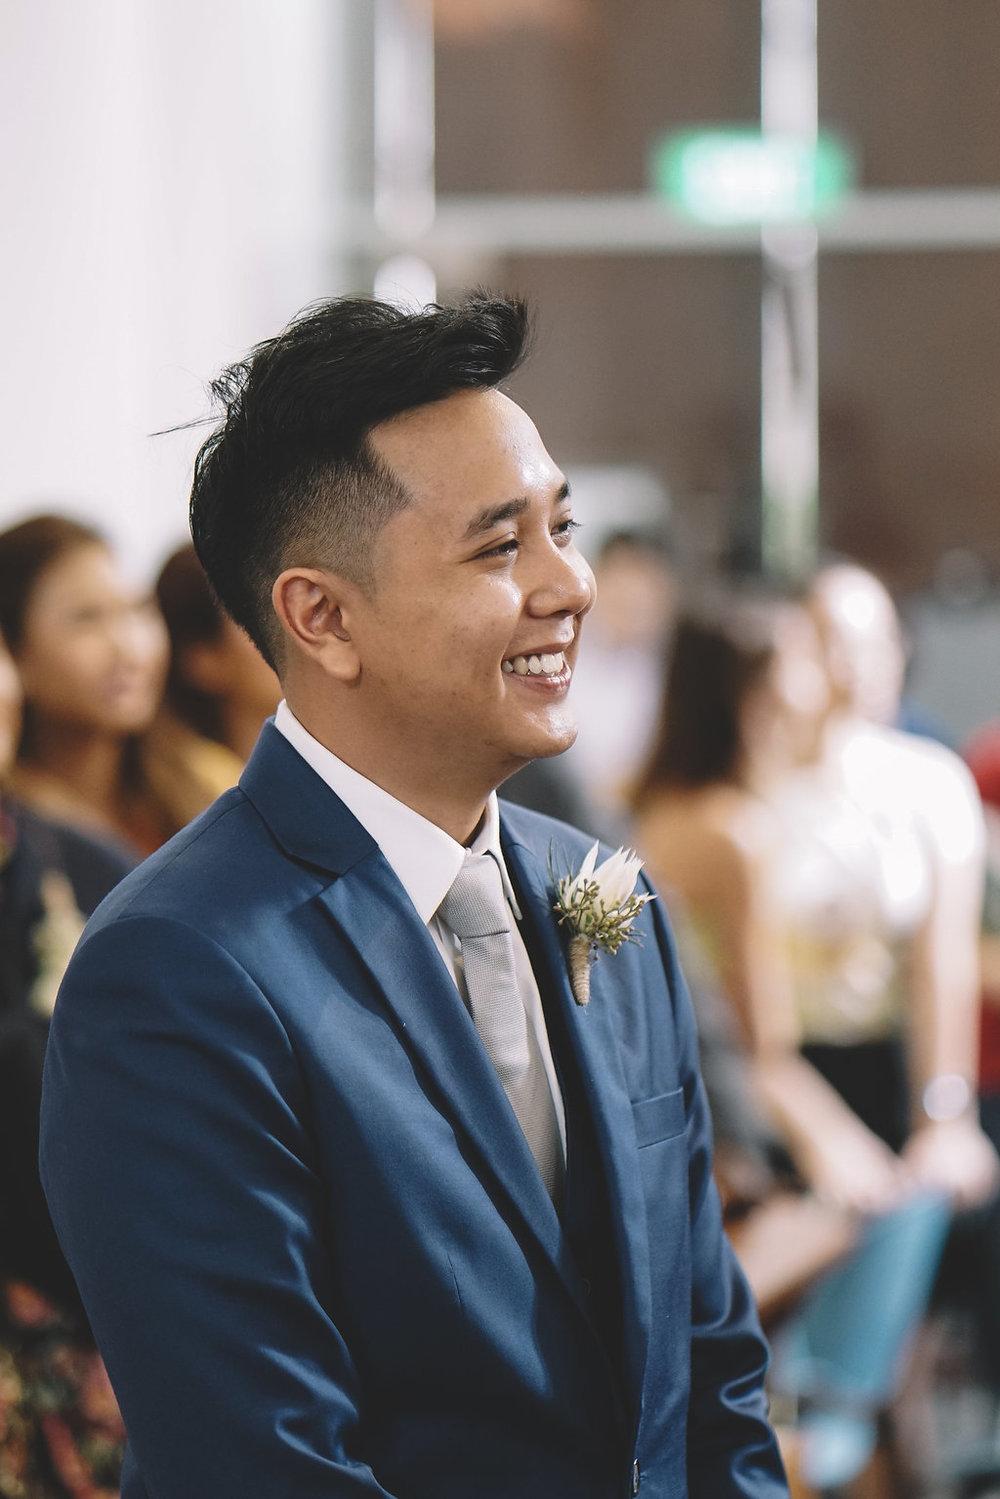 Singapore Wedding Photography The White Rabbit-40.jpg